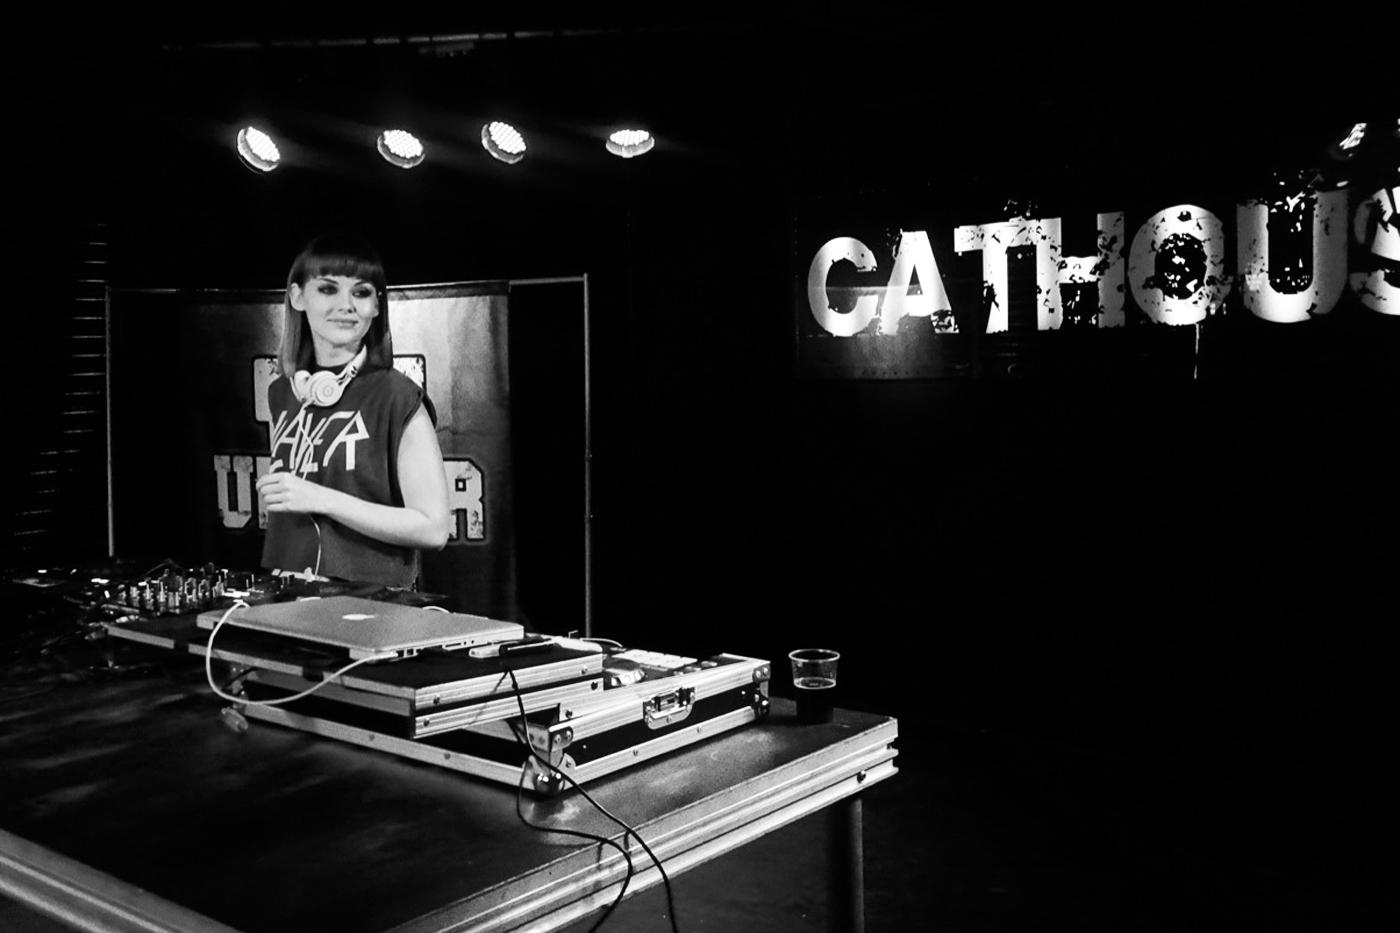 Uprawr Glasgow Cathouse Launch Party - April 2015